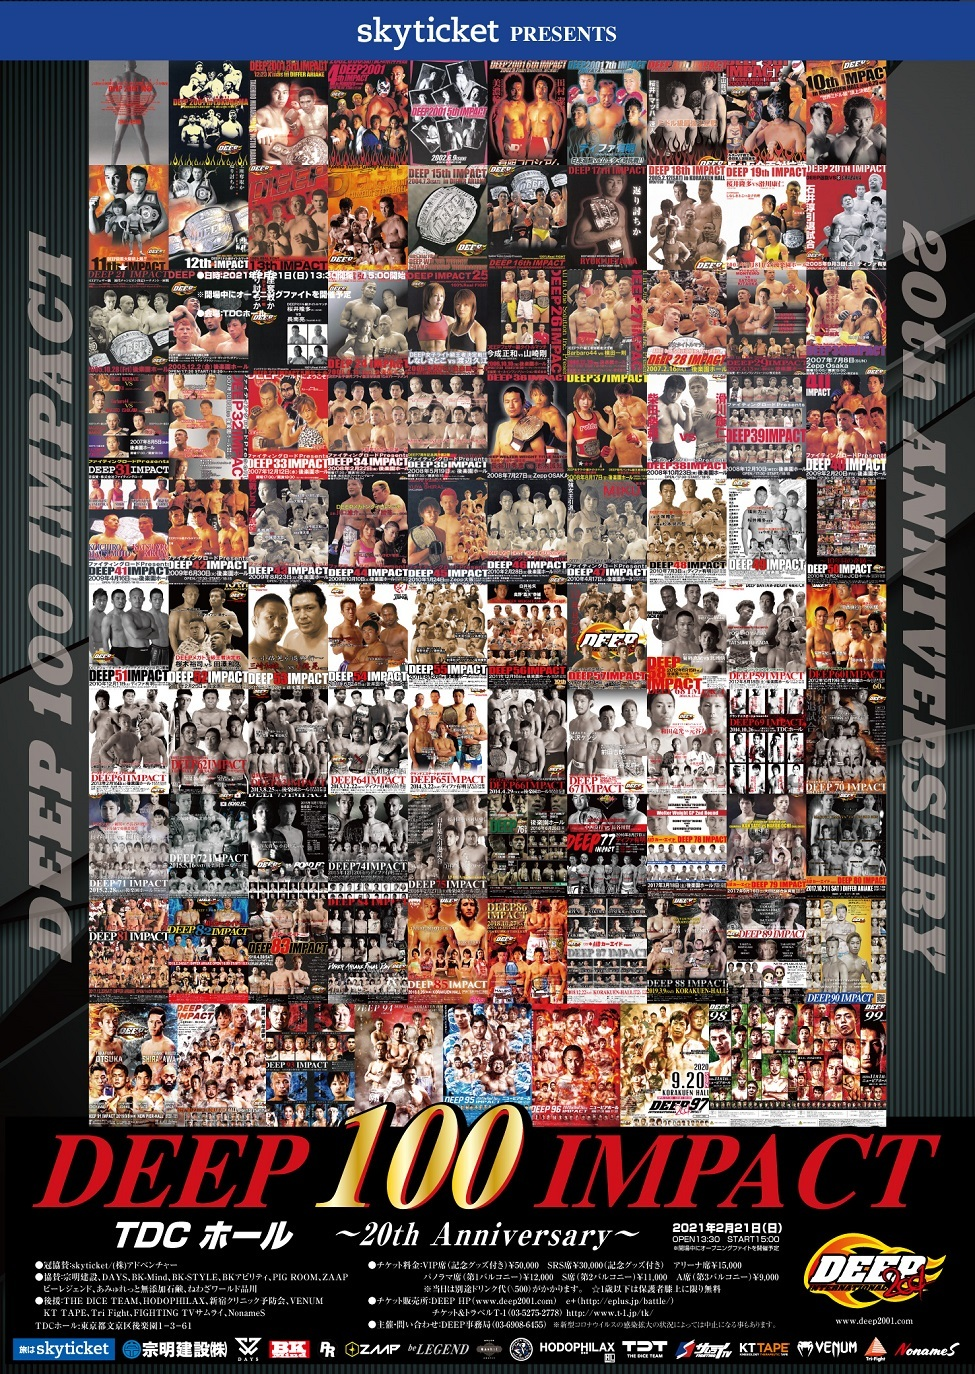 『skyticket Presents DEEP 100 IMPACT ~20th Anniversary~』